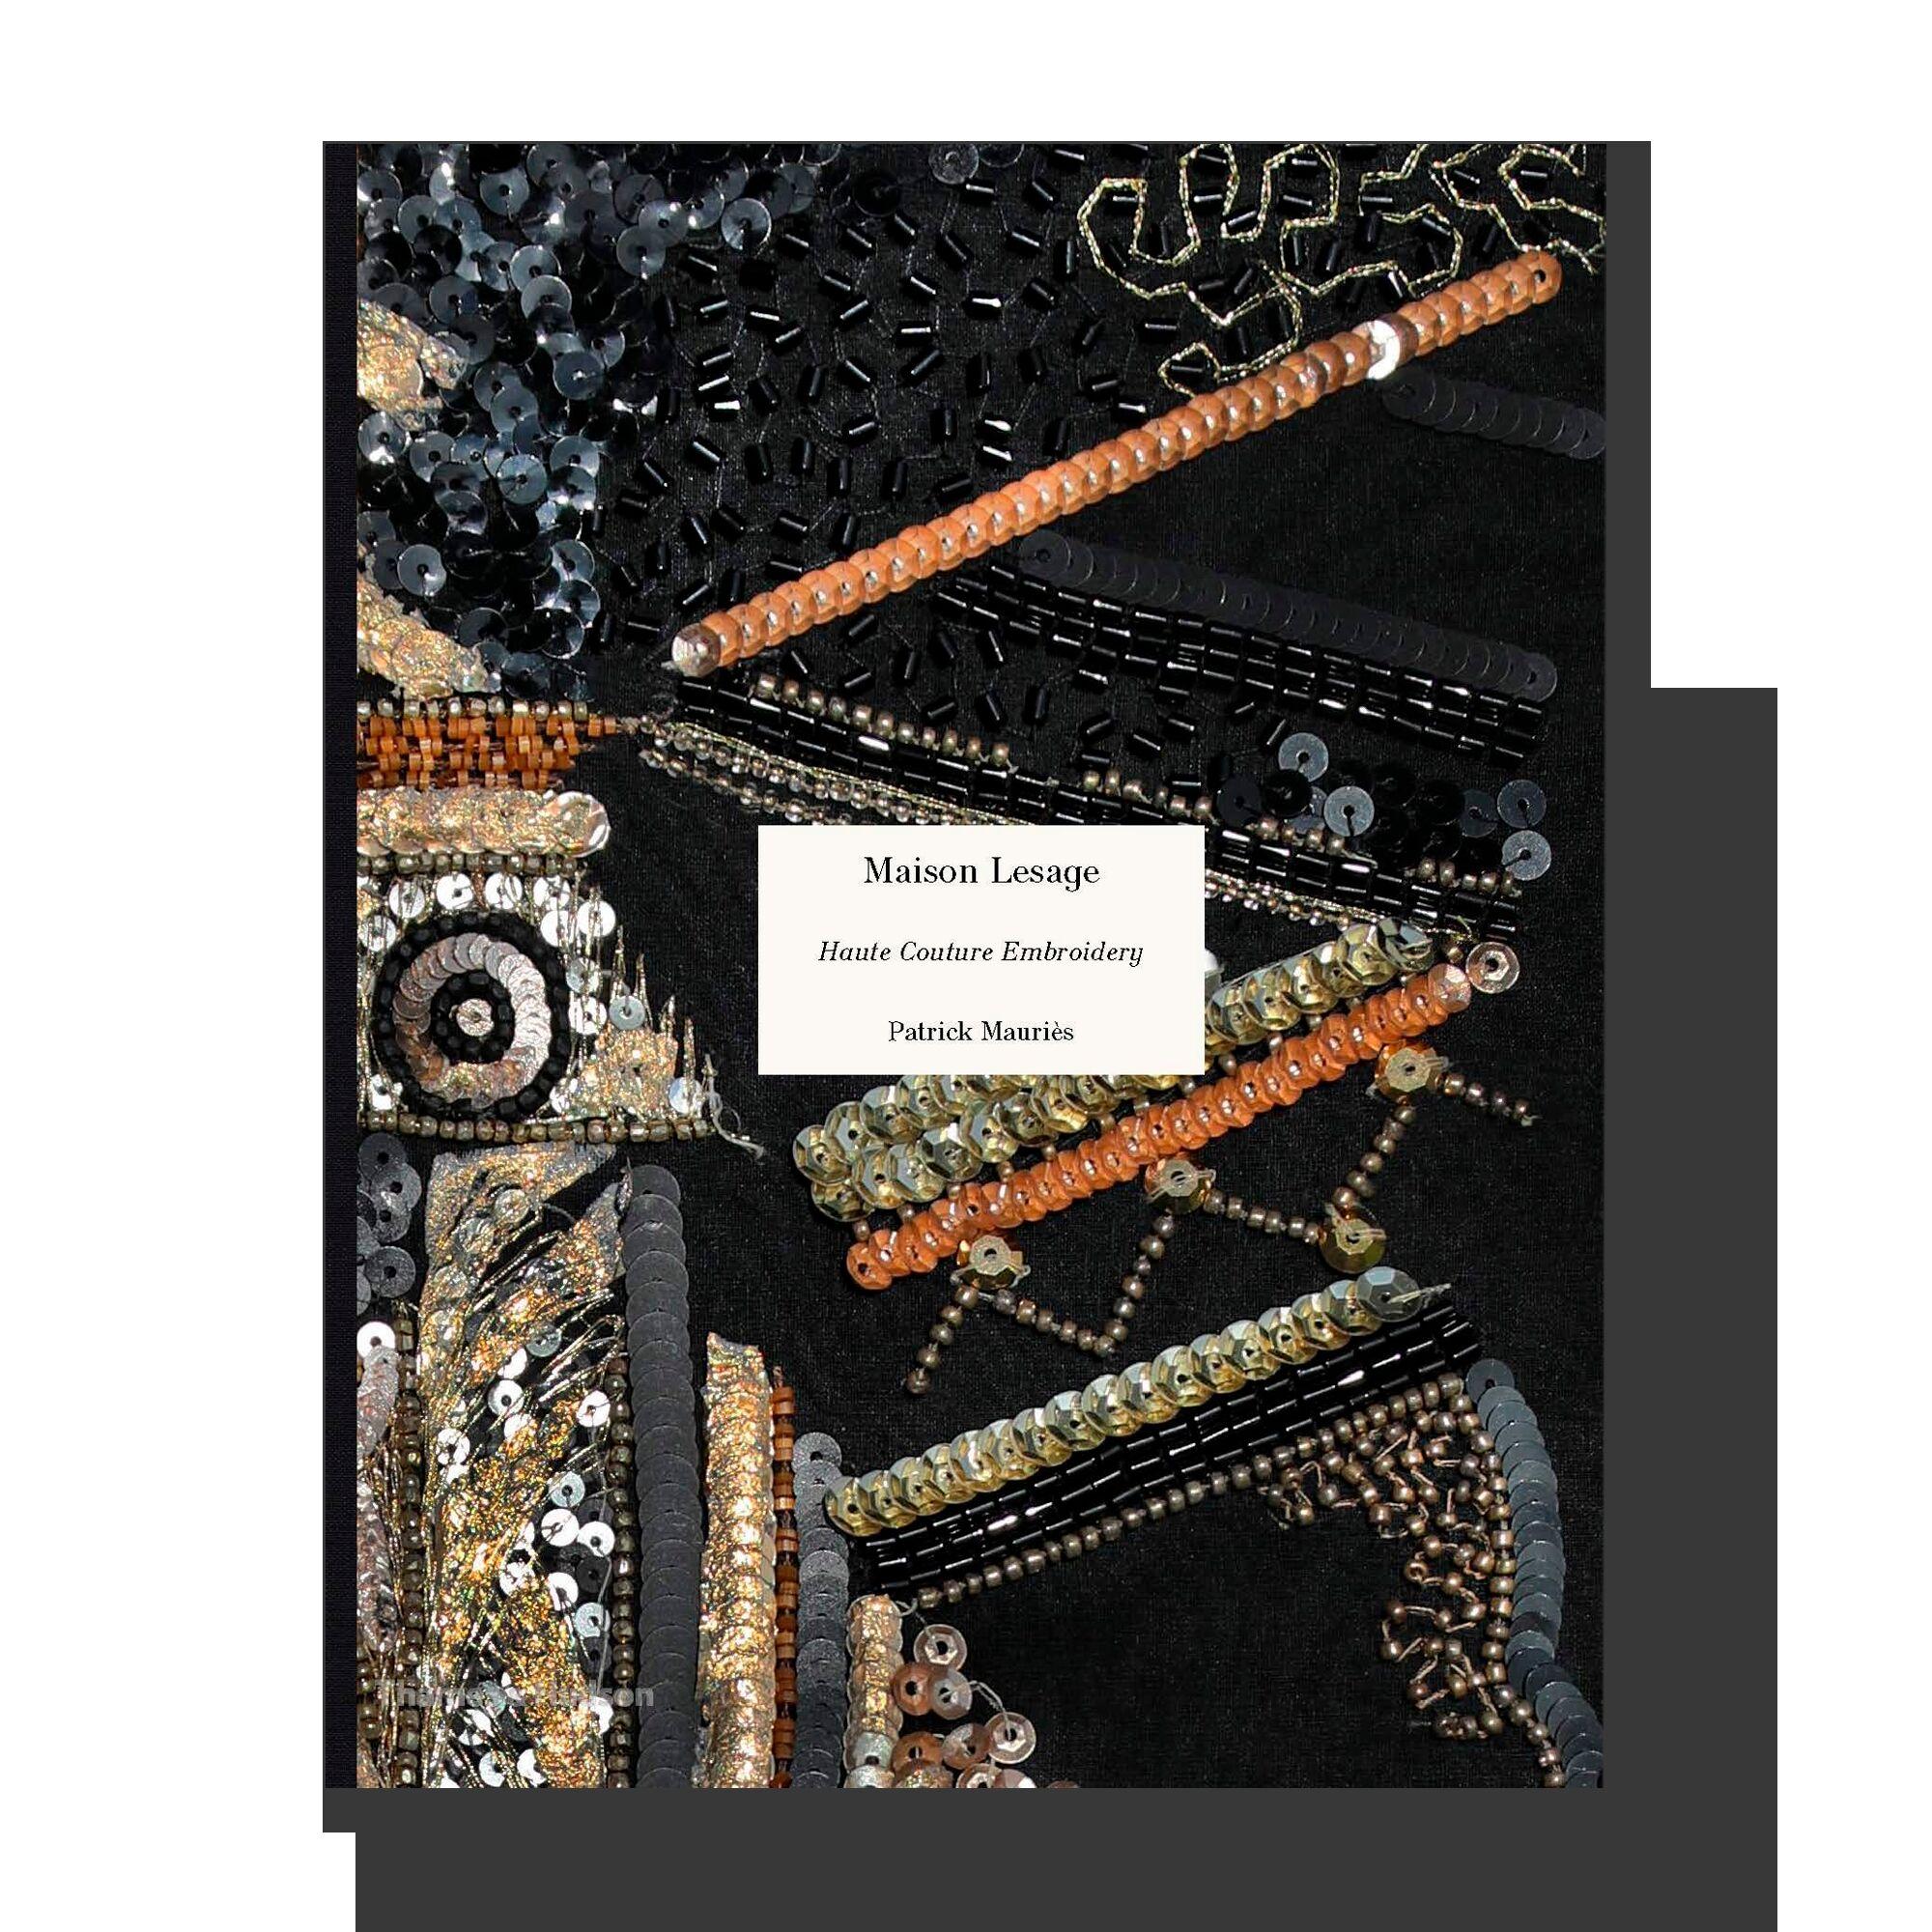 Maison Lesage: Haute Couture Embroidery